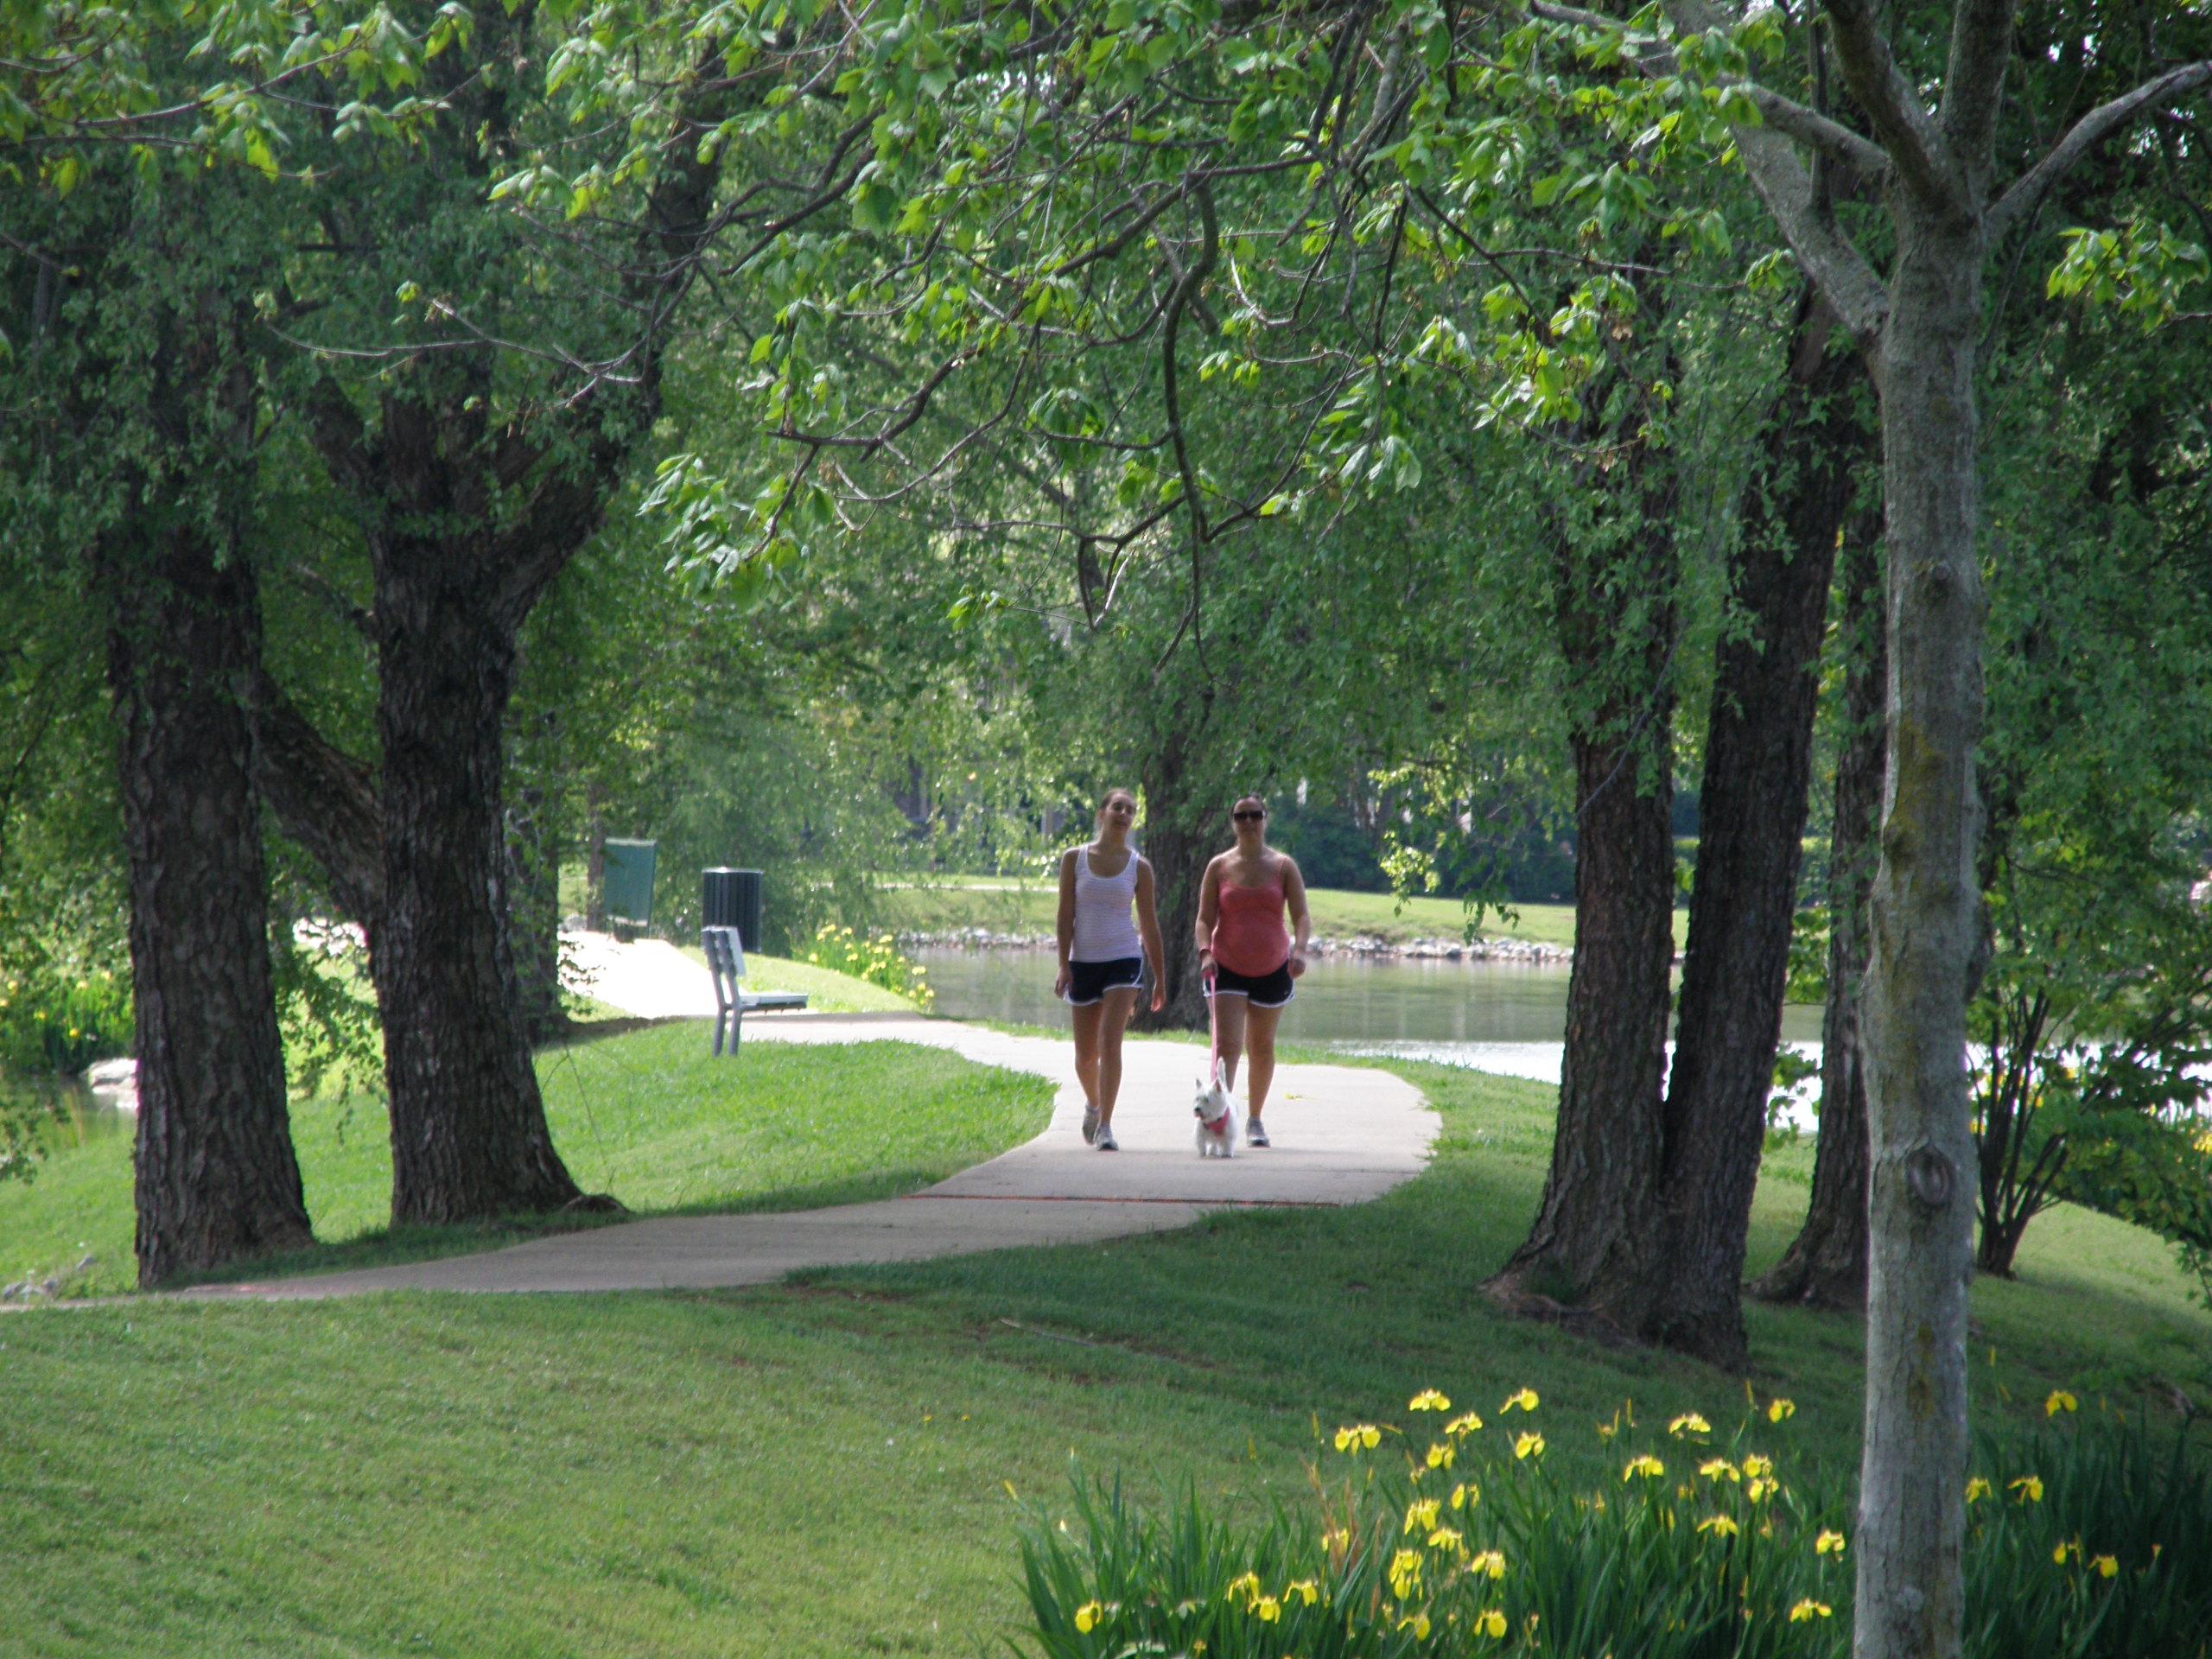 Walking path photo